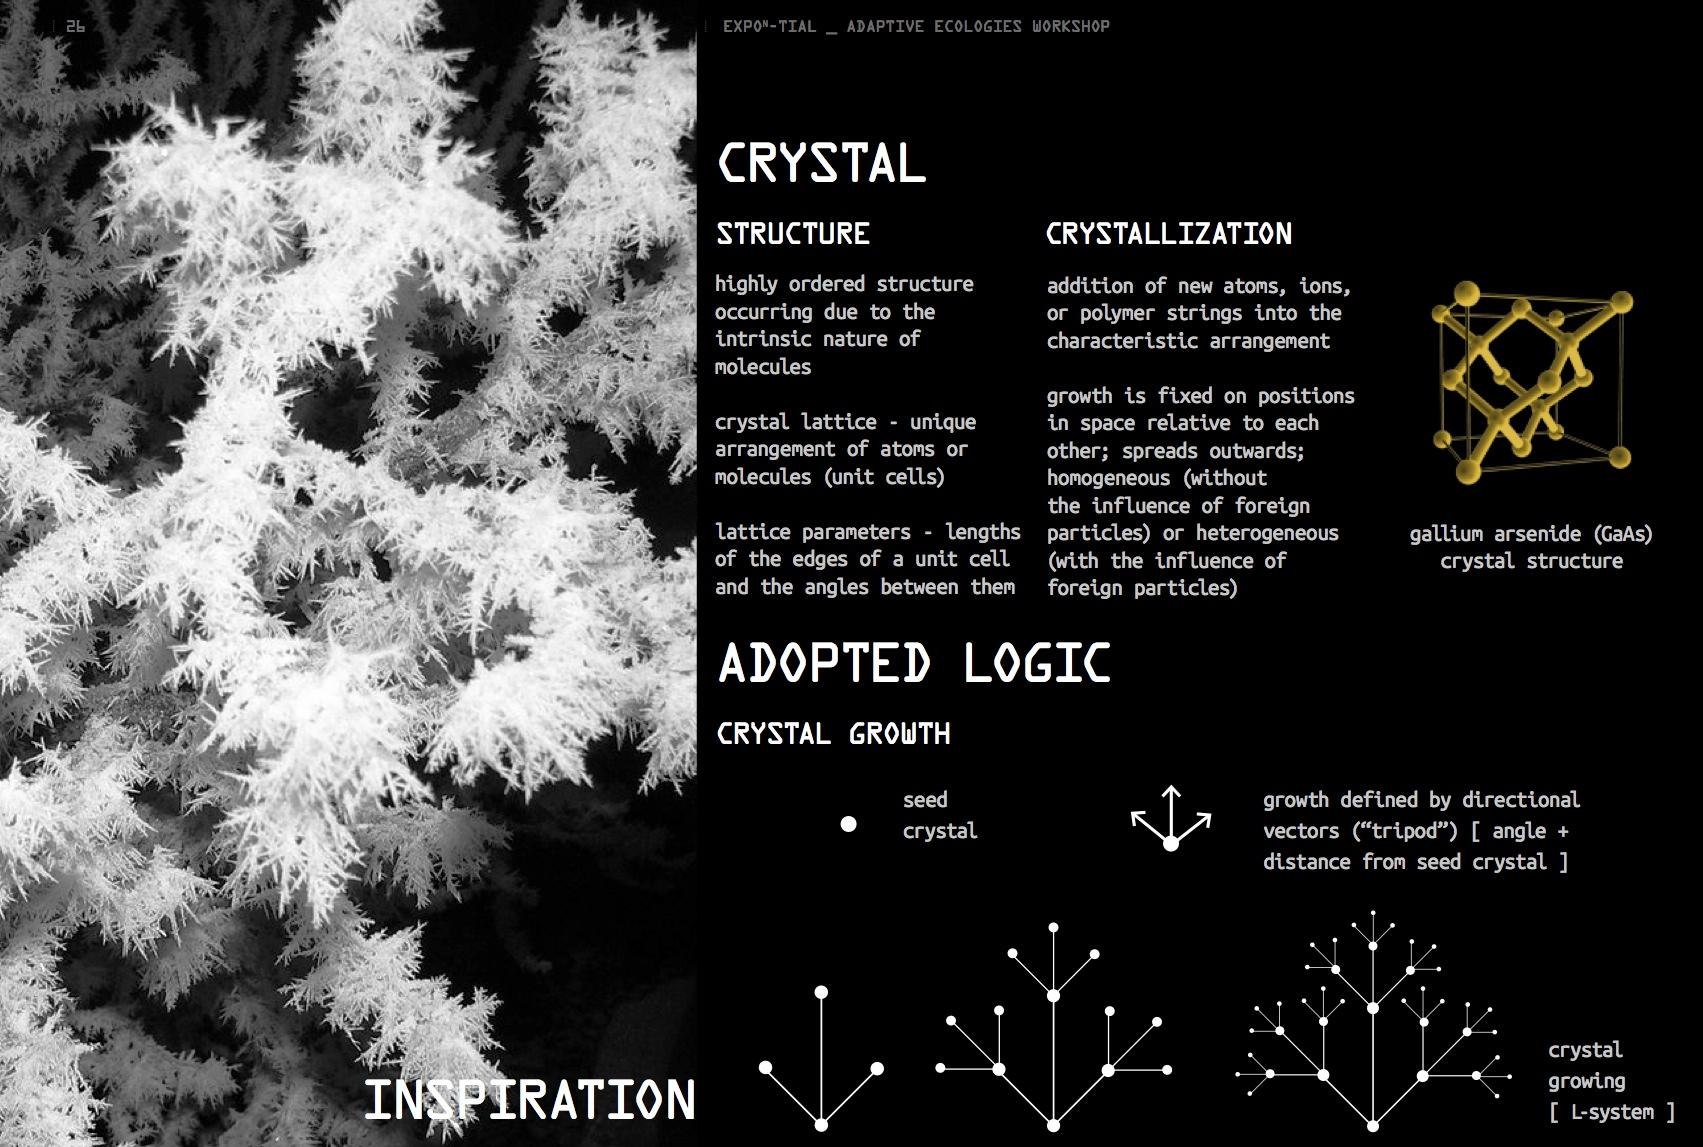 expon-tial-7.jpg